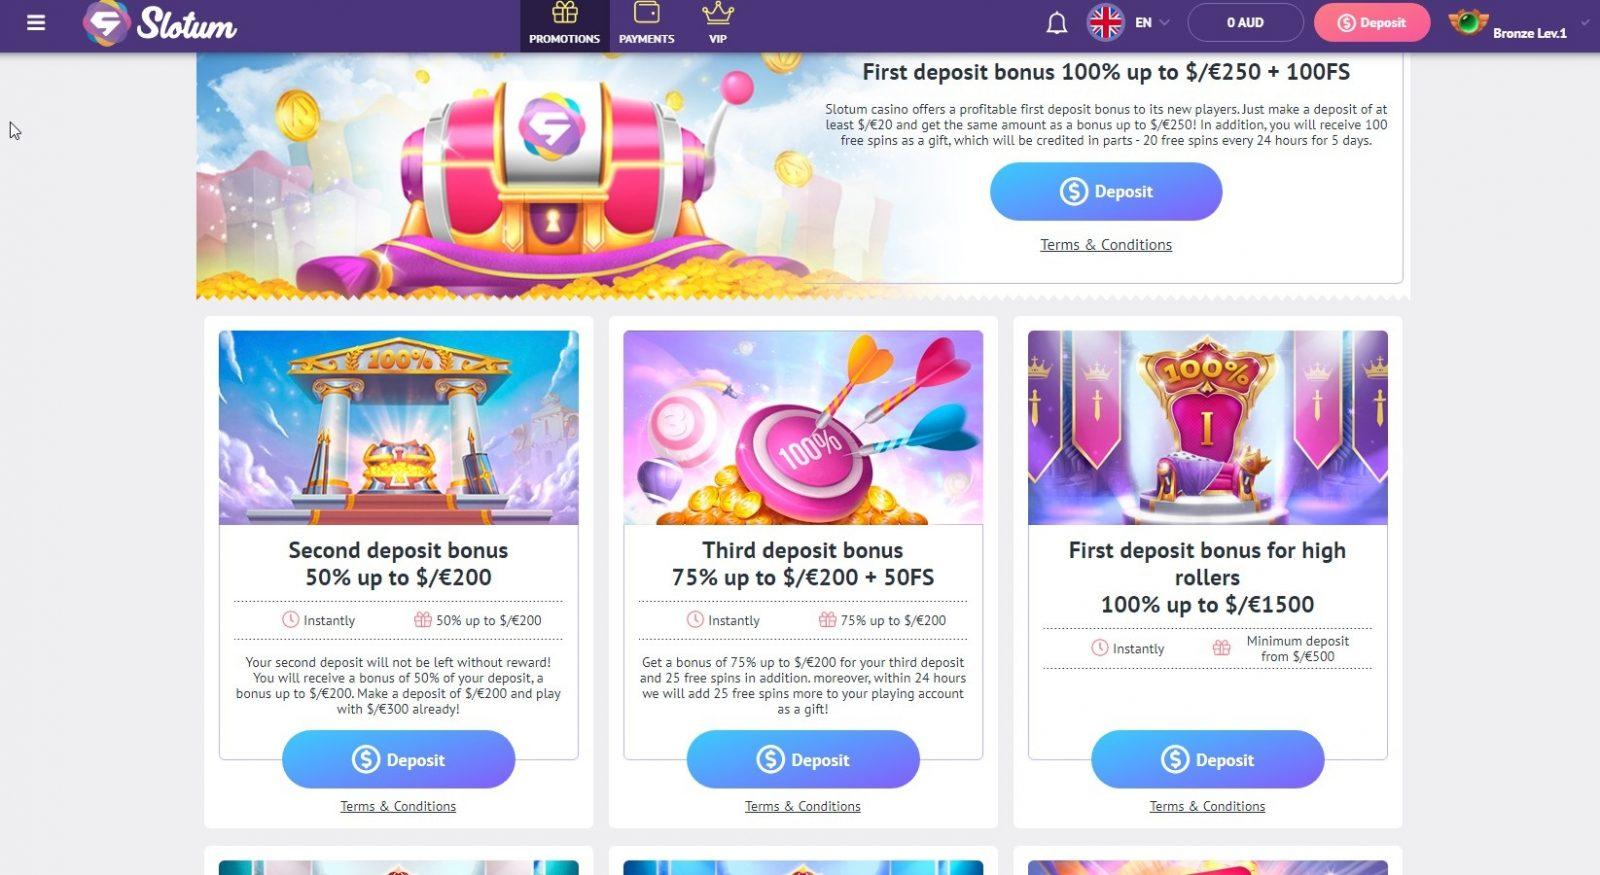 Slotum_casino_Welcome_Bonus_€200_100%